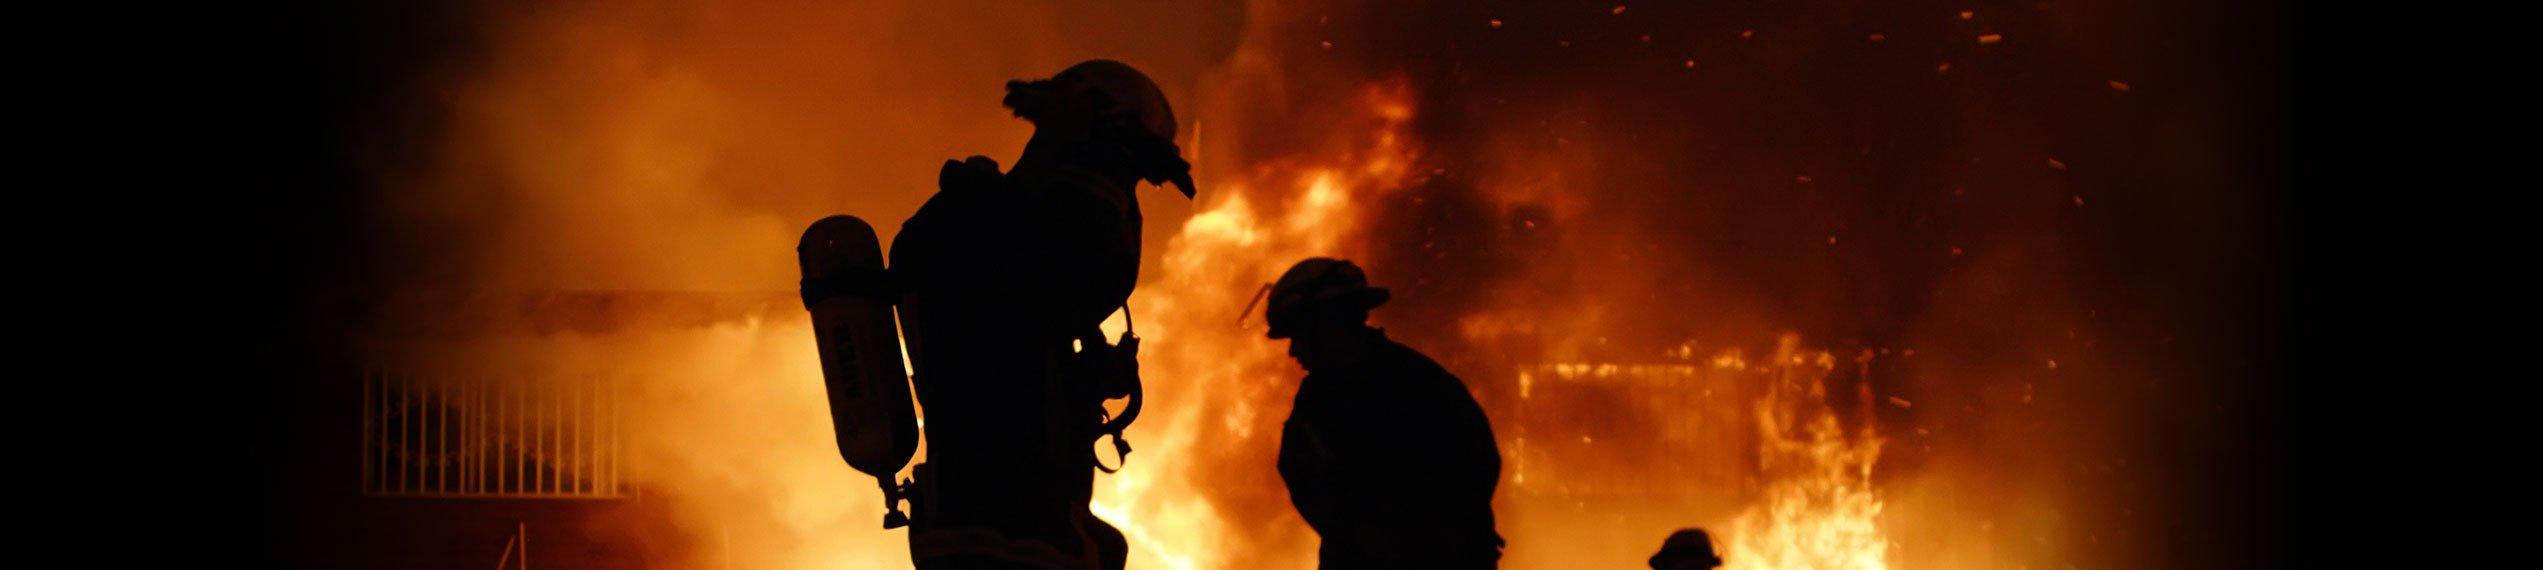 Fire & Smoke Damage Removal in Paul Davis Restoration of Northeast Georgia